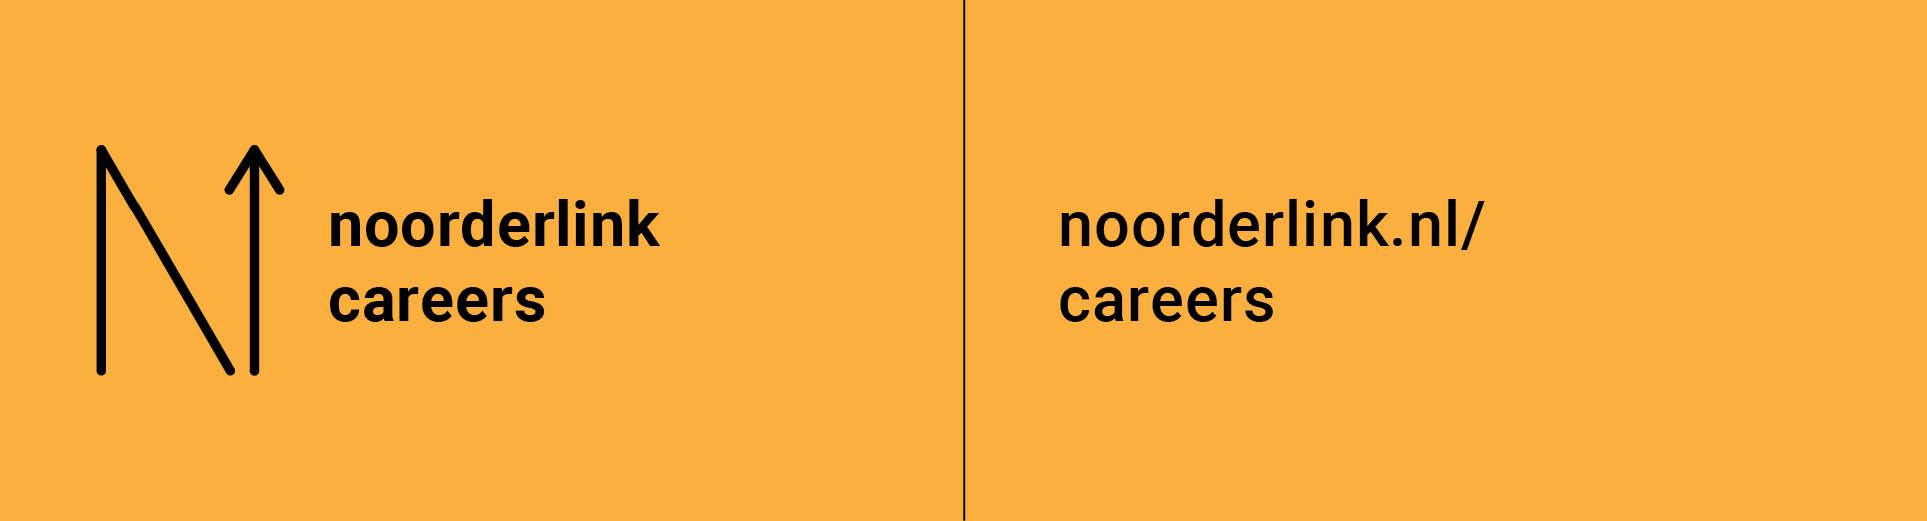 Noorderlink Careers: Lef'L Up! opleidingsprogramma januari 2019